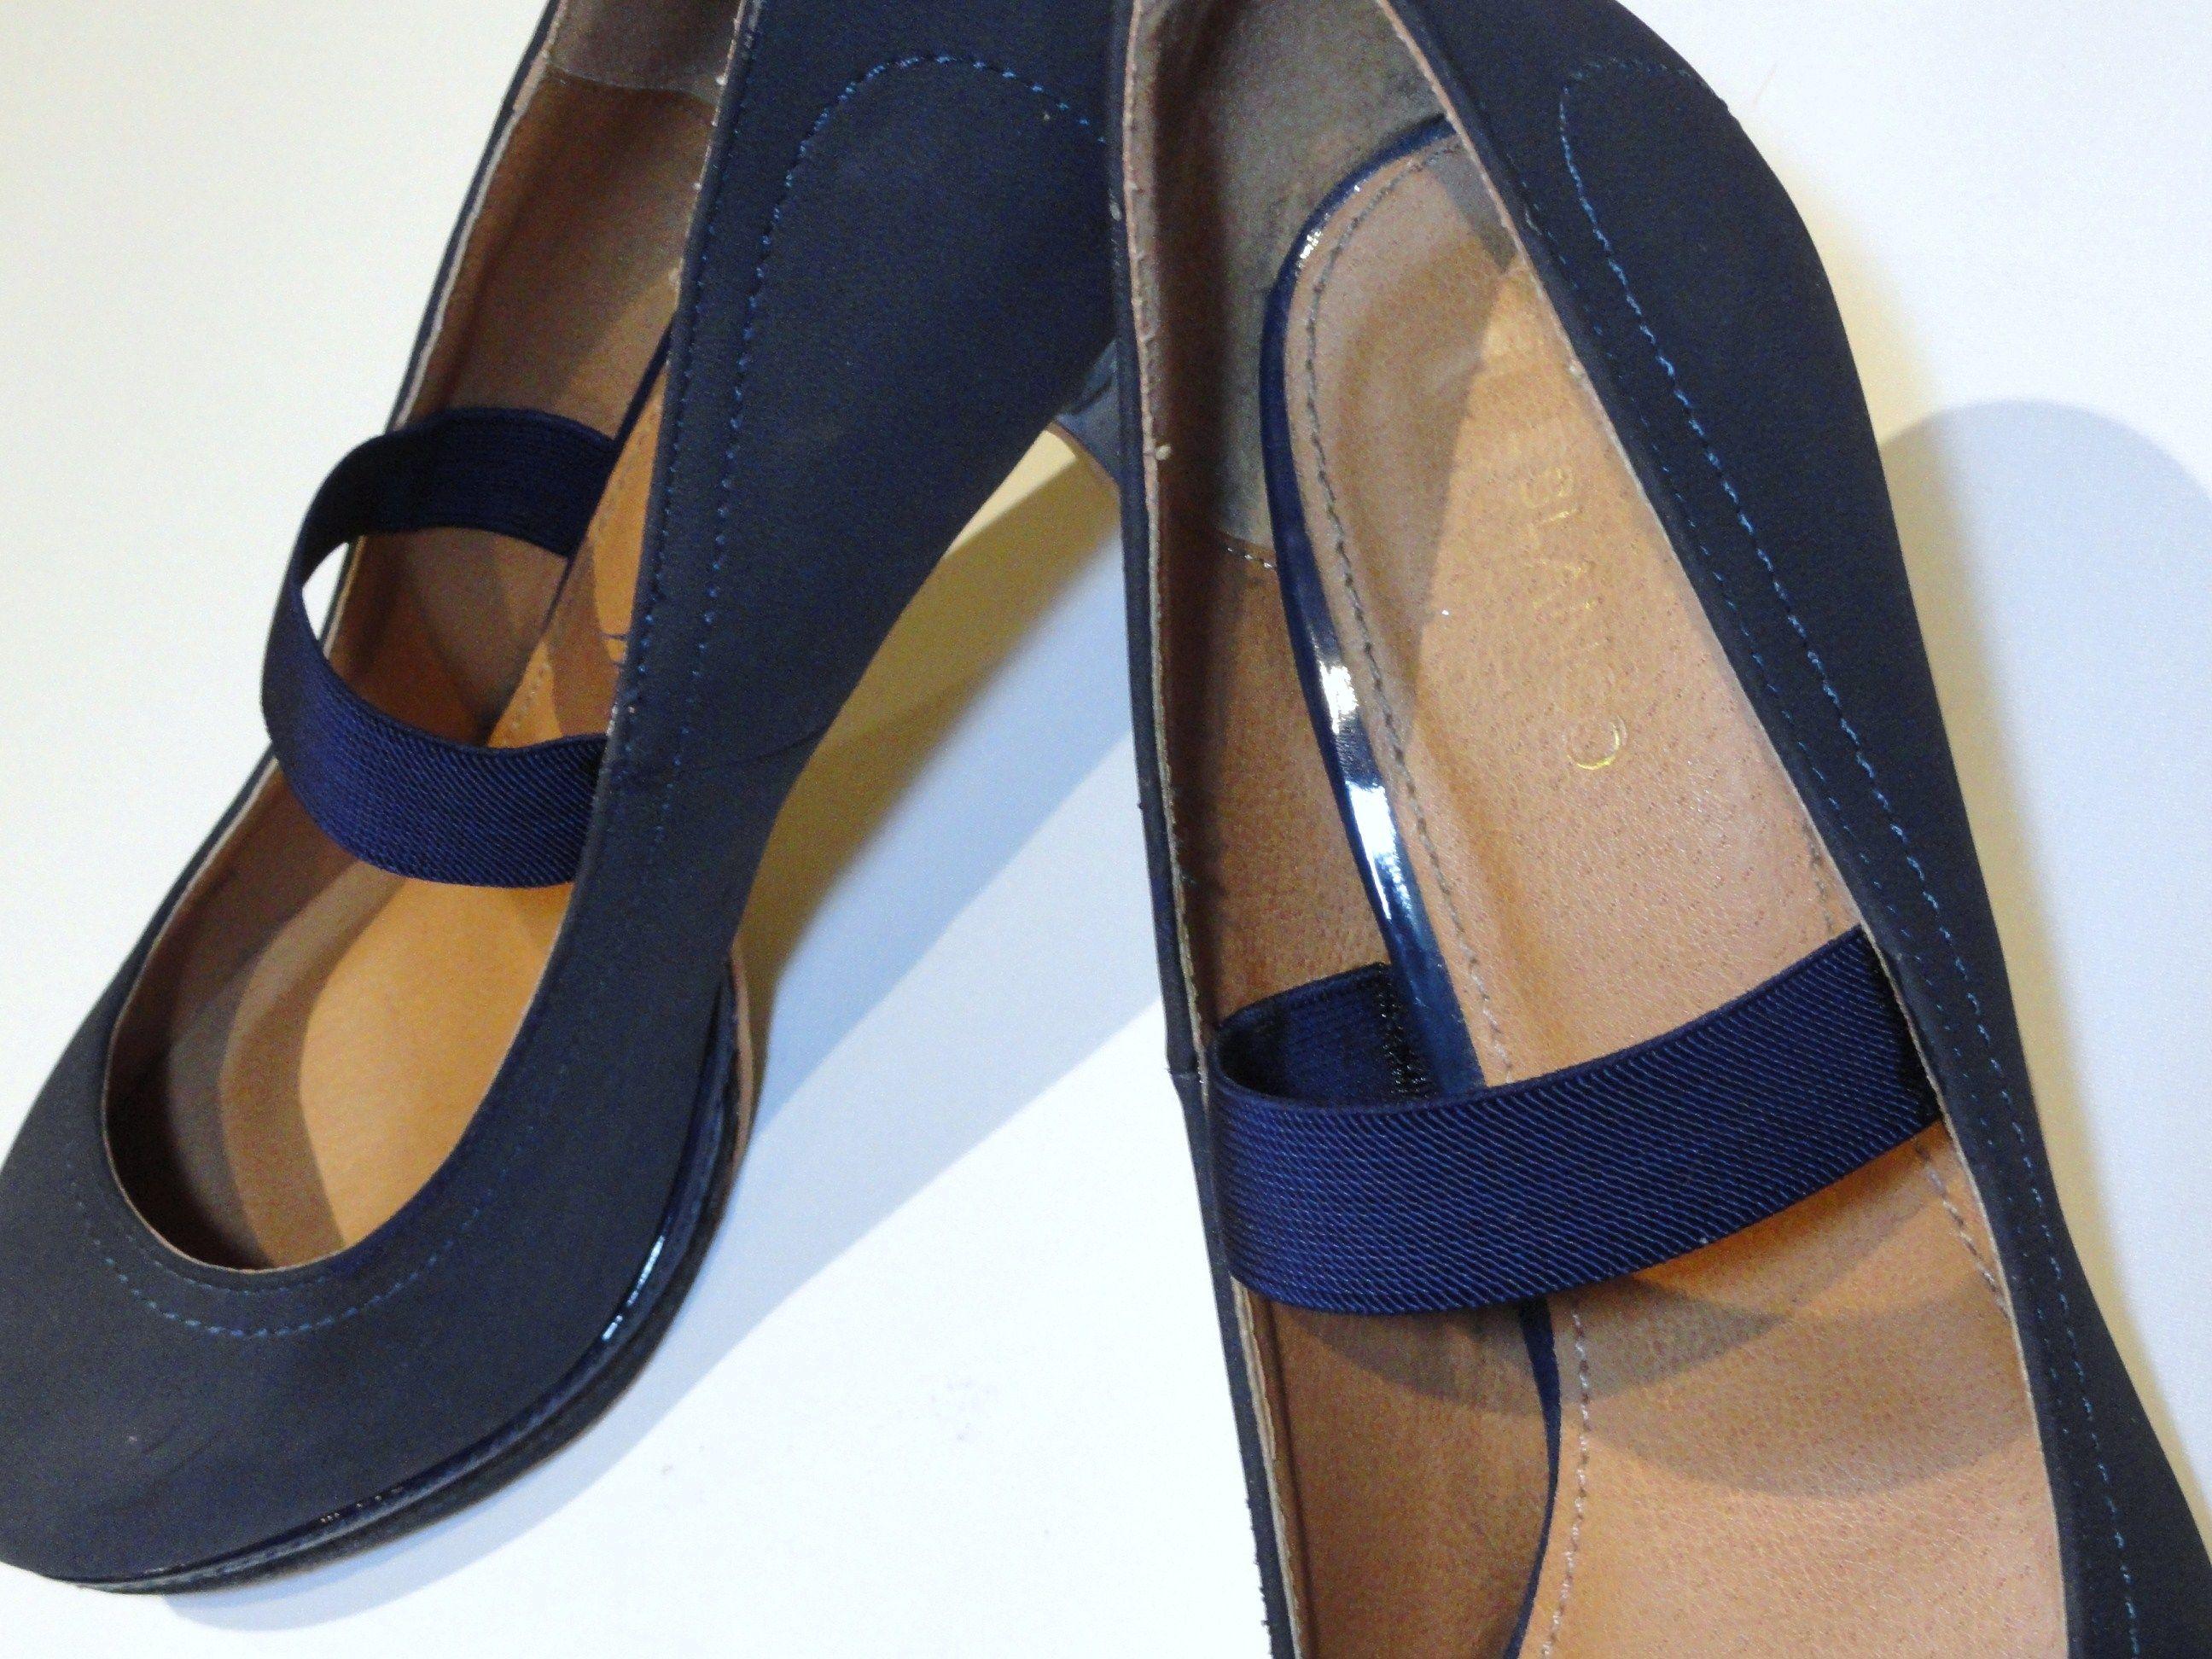 a6d9b607 How to fix shoes that are too big. lapiperiadenewyorkdiy. Consejos Útiles,  Consejos De